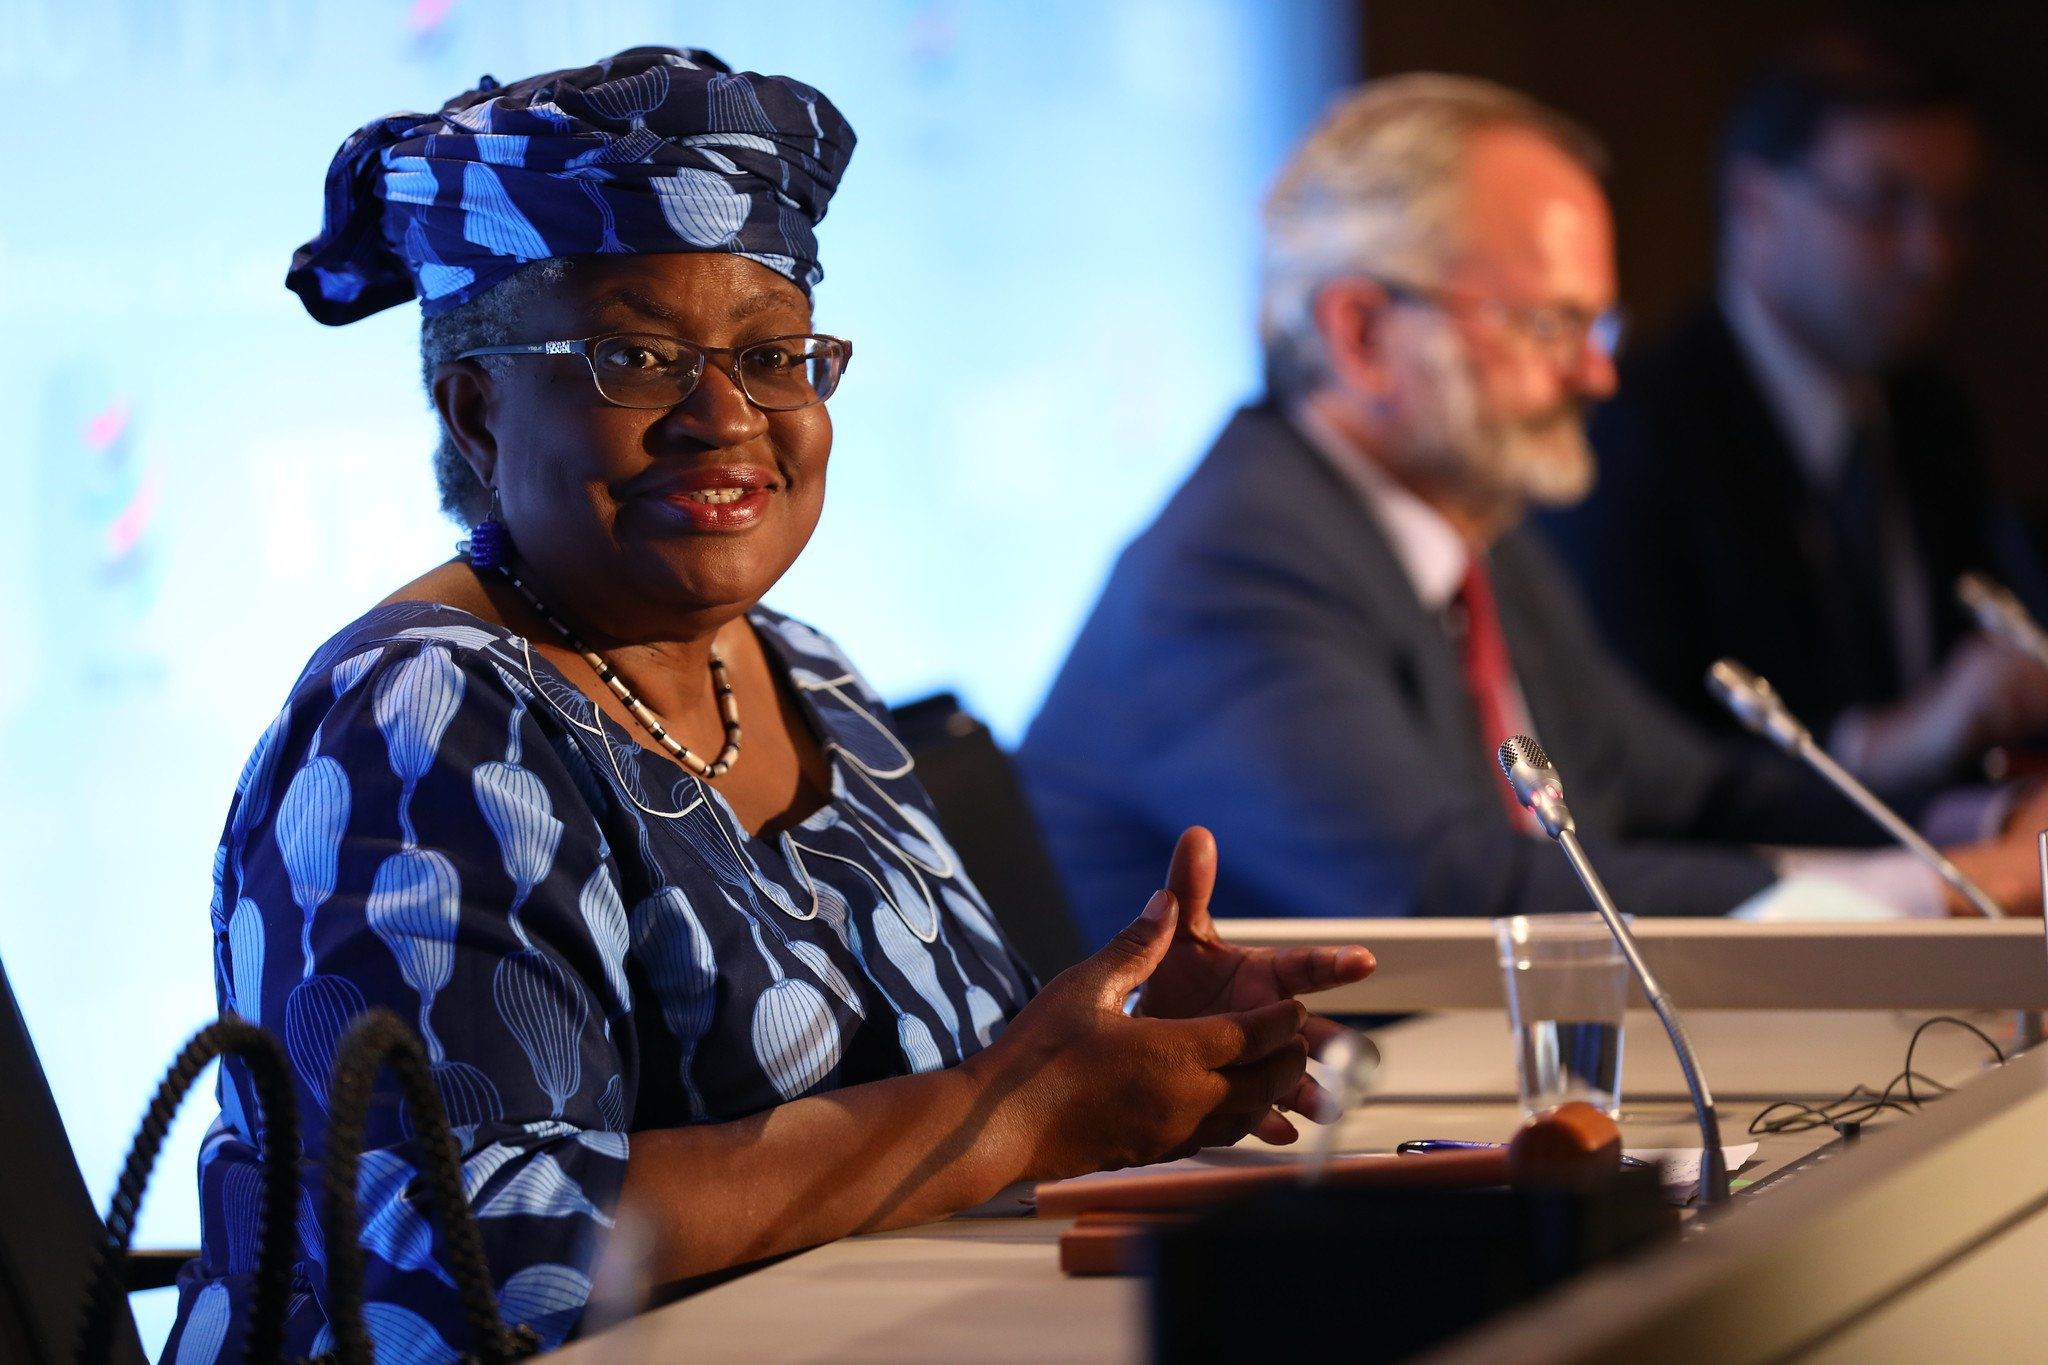 ngozi-okonjo-iweala-world-trade-organization-women-leaders-flickr